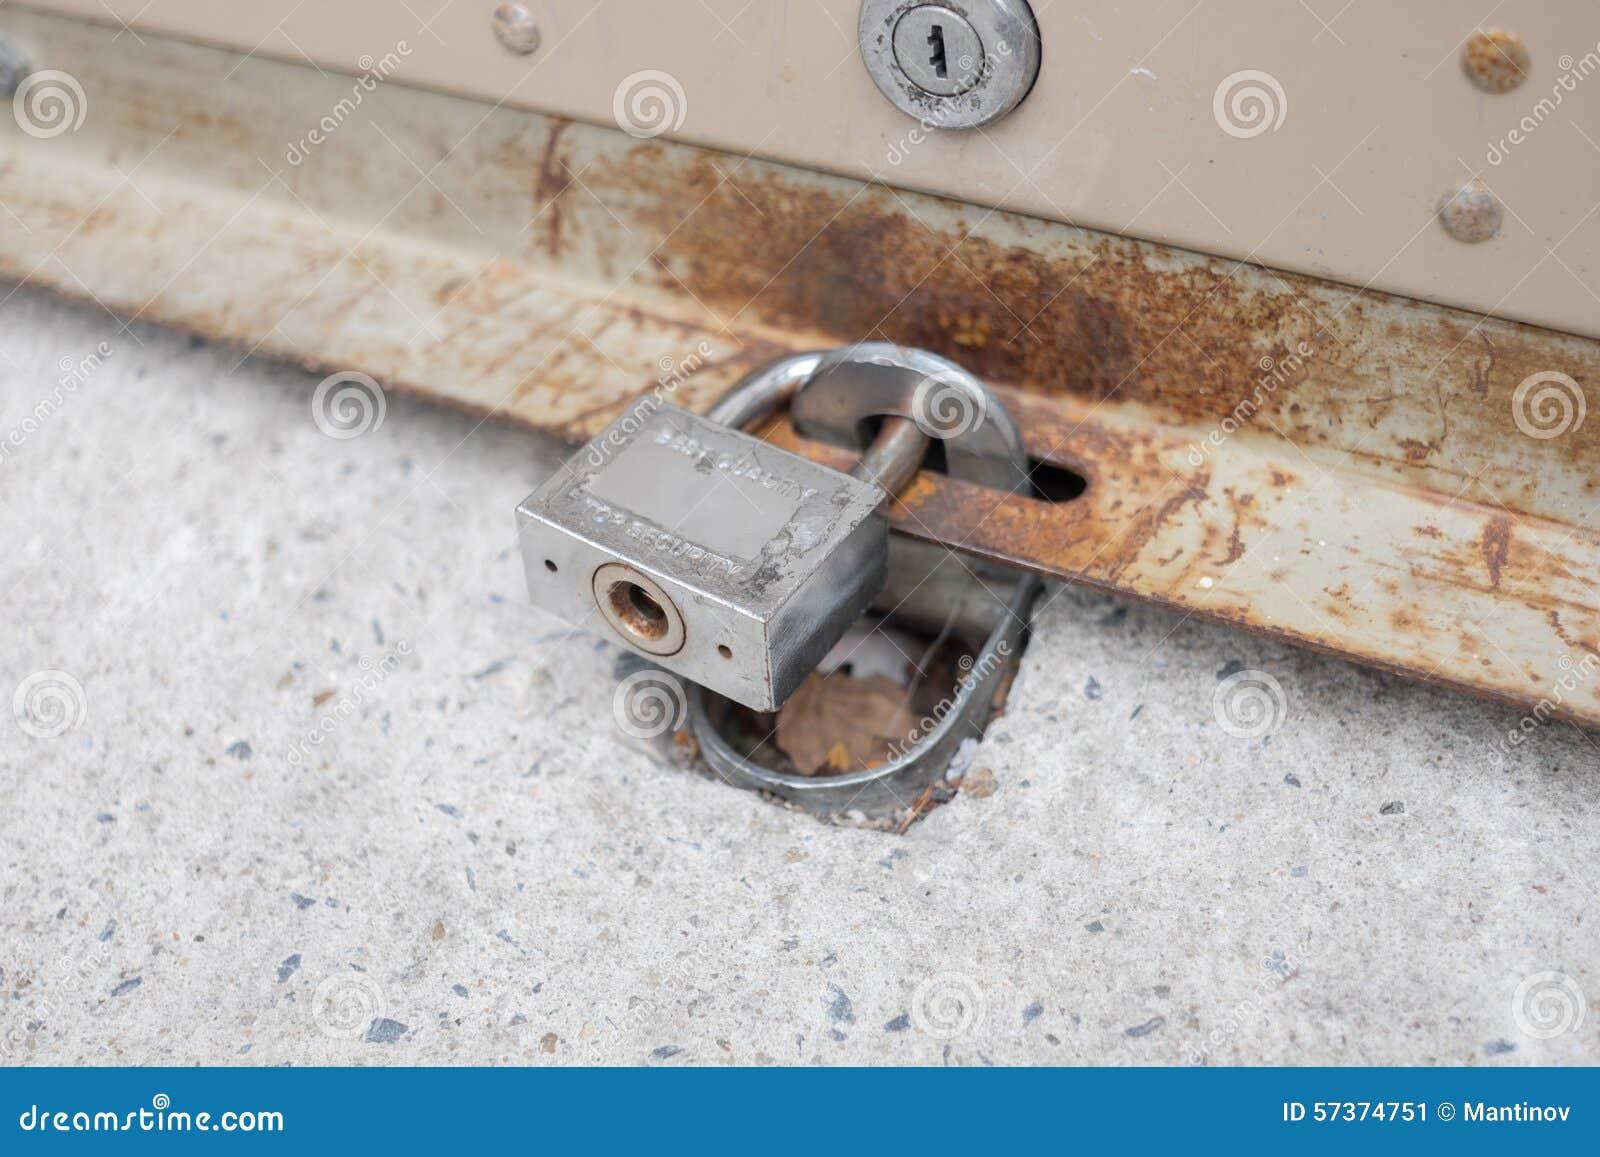 Rollengaragentor ist- geschlossen und verschlossen